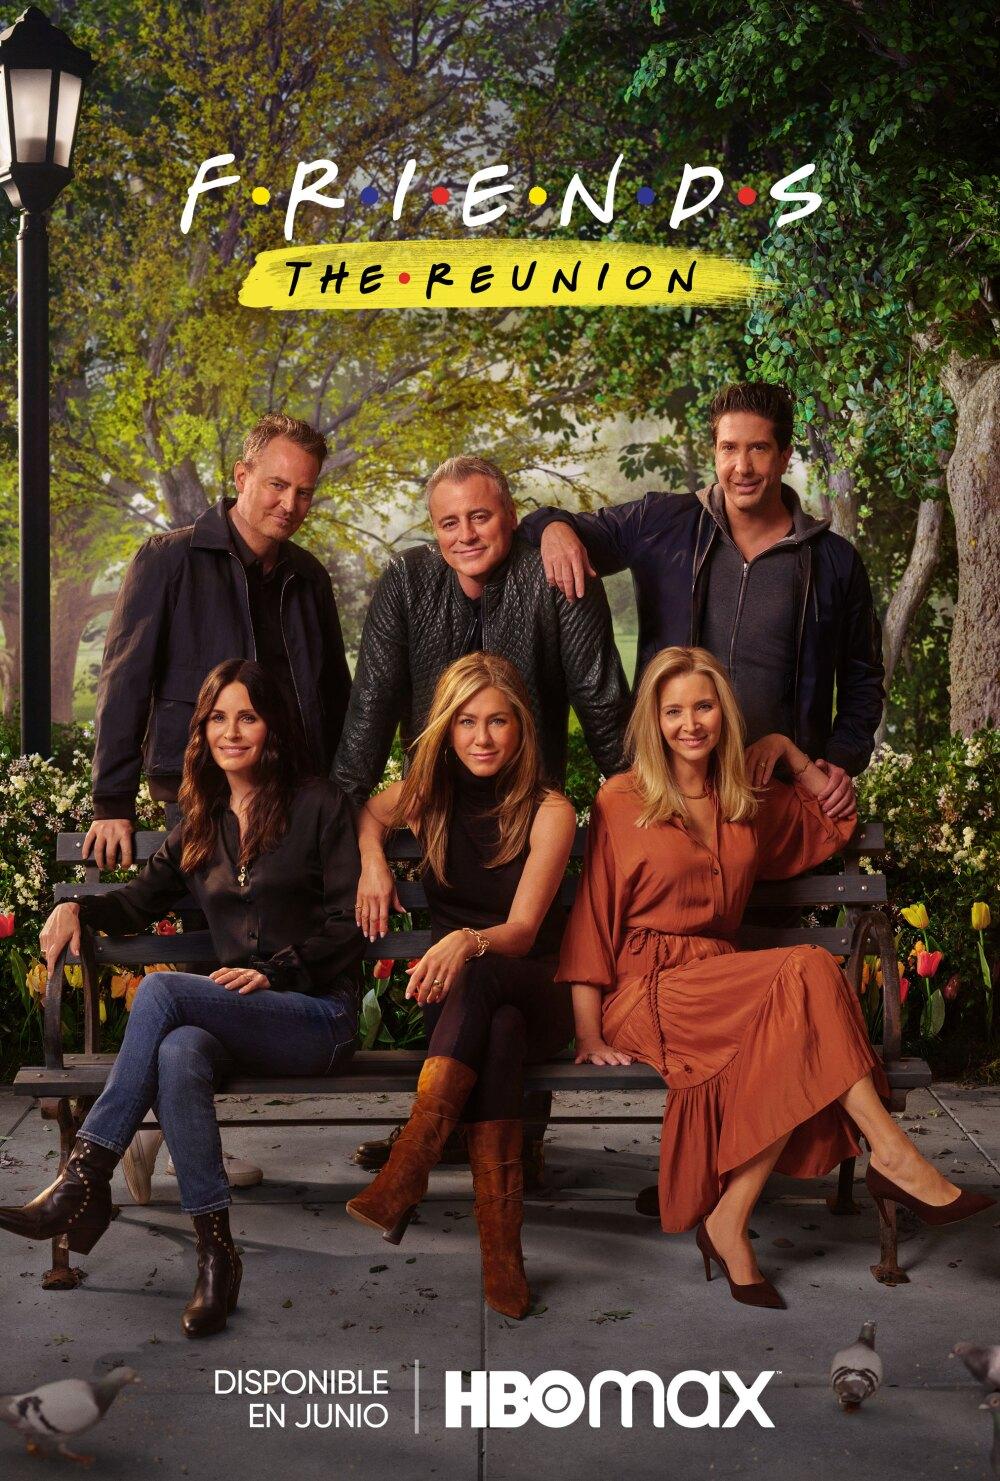 WM_MO_Friends_The_Reunion_KA_PO_RGB_DOM_Tunein_LATAM.p.jpg